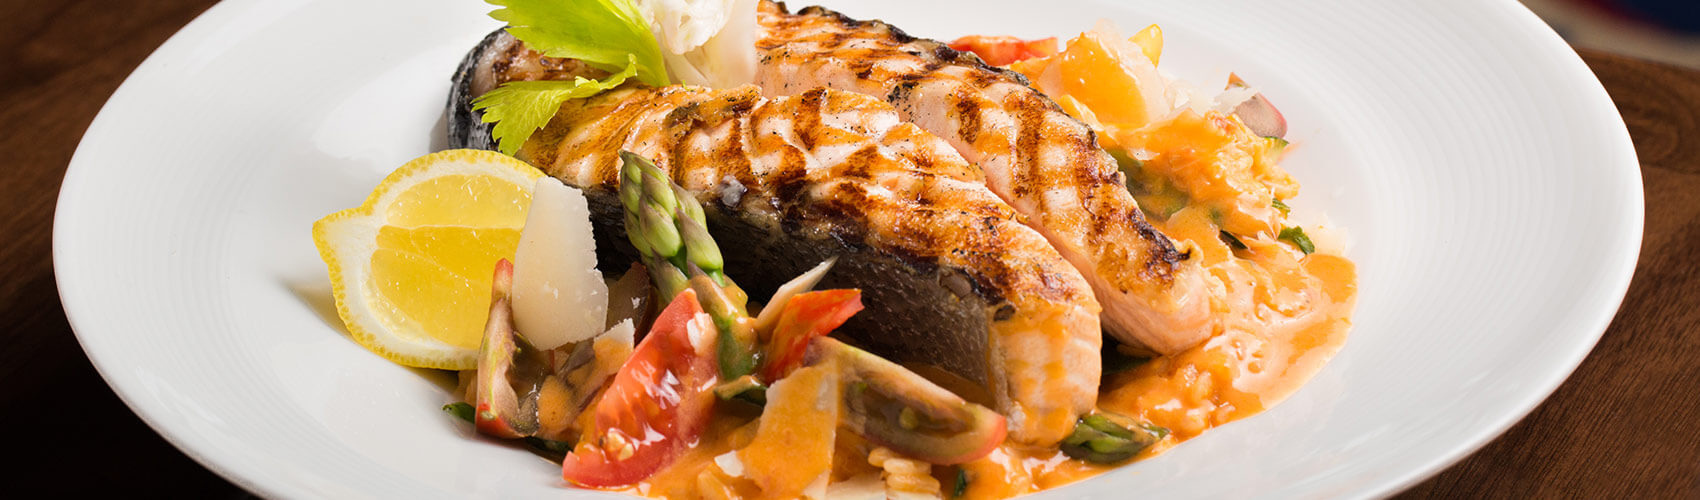 Restaurantes em Palm Beach: restaurante Flagler Steakhouse